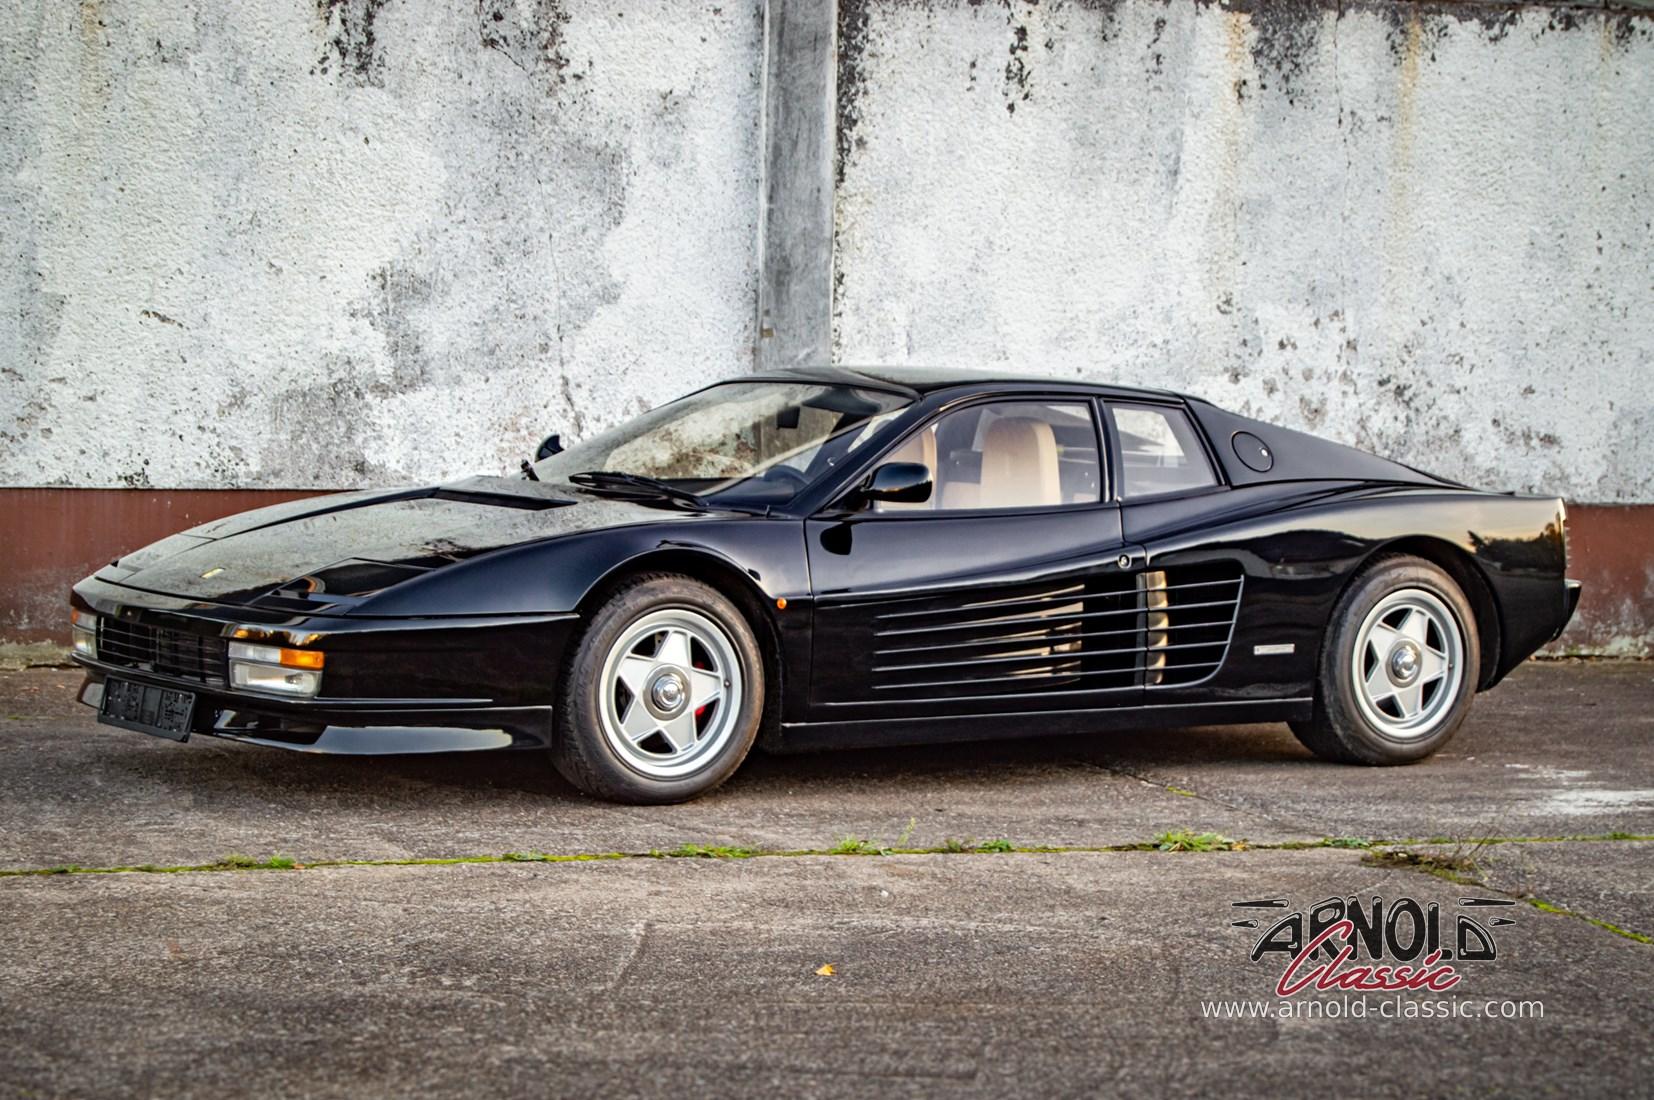 Ferrari Testarossa Arnold Classic